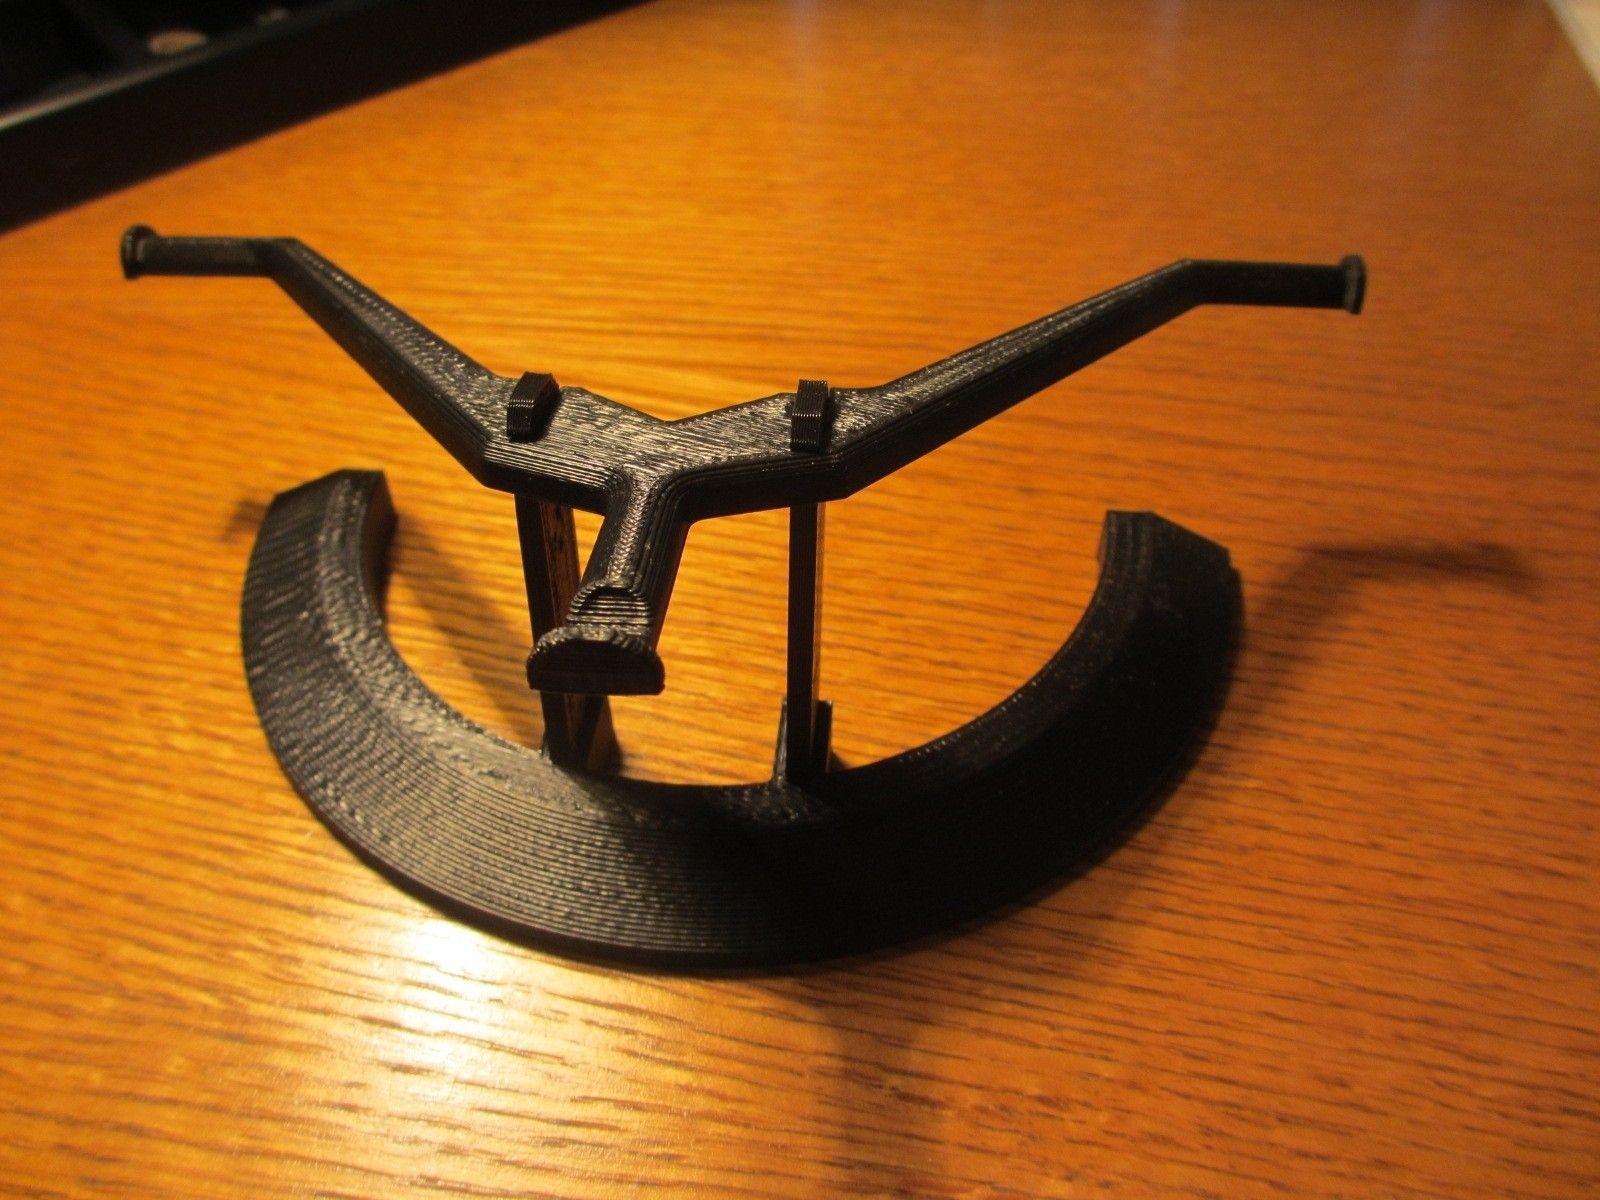 My new cool 3D Printed Display stands! - 002.JPG